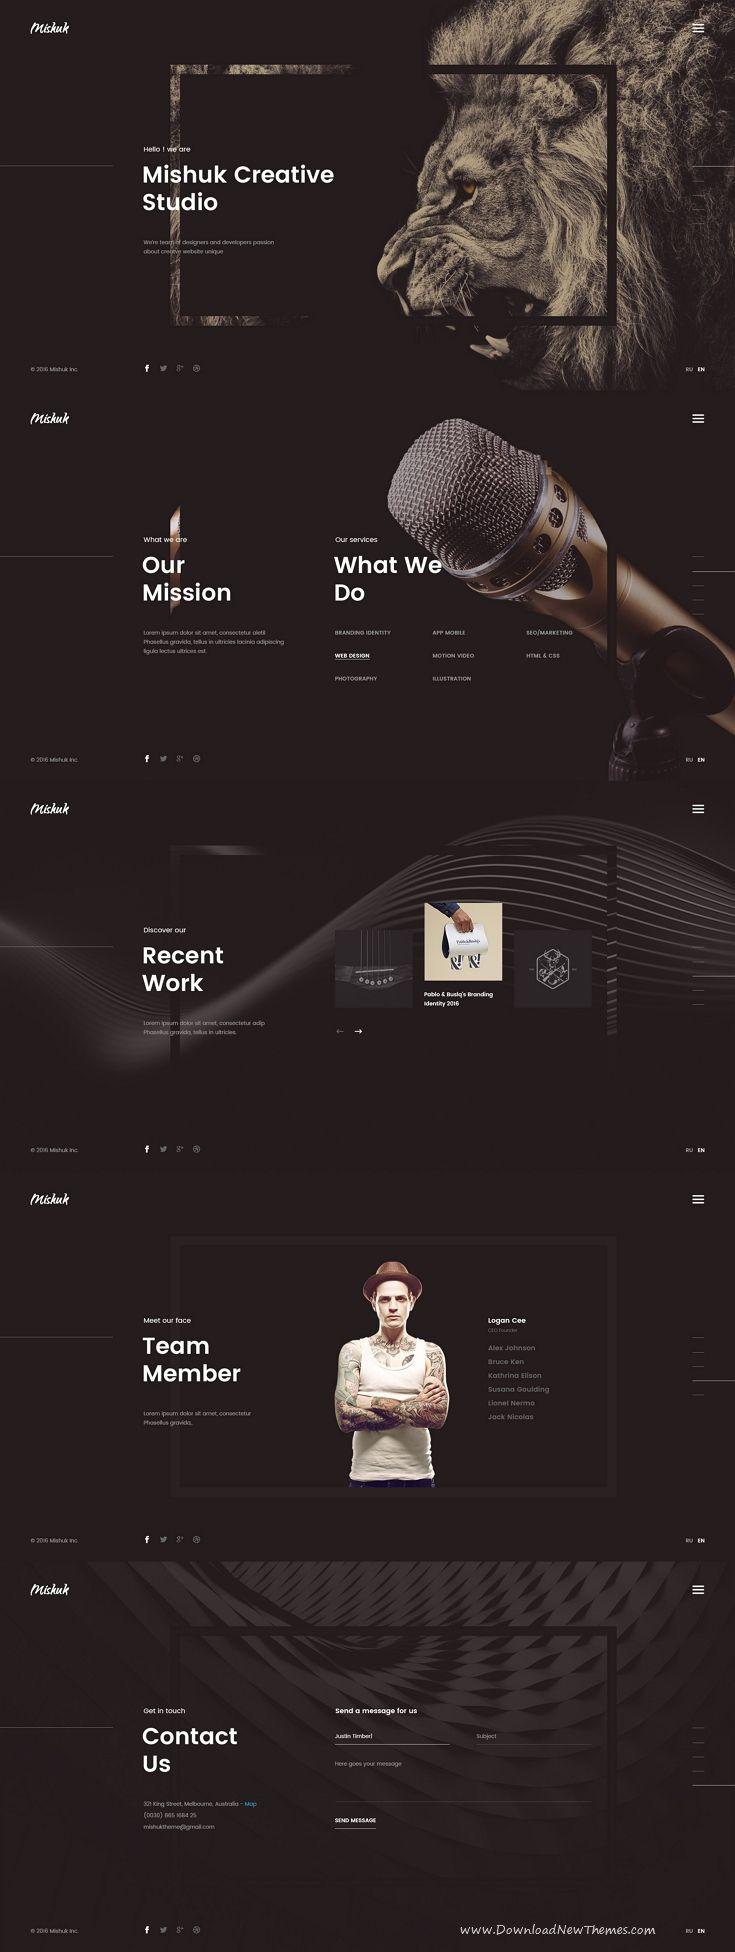 Mishuk - Creative PSD Template   Psd templates, Creative design and ...